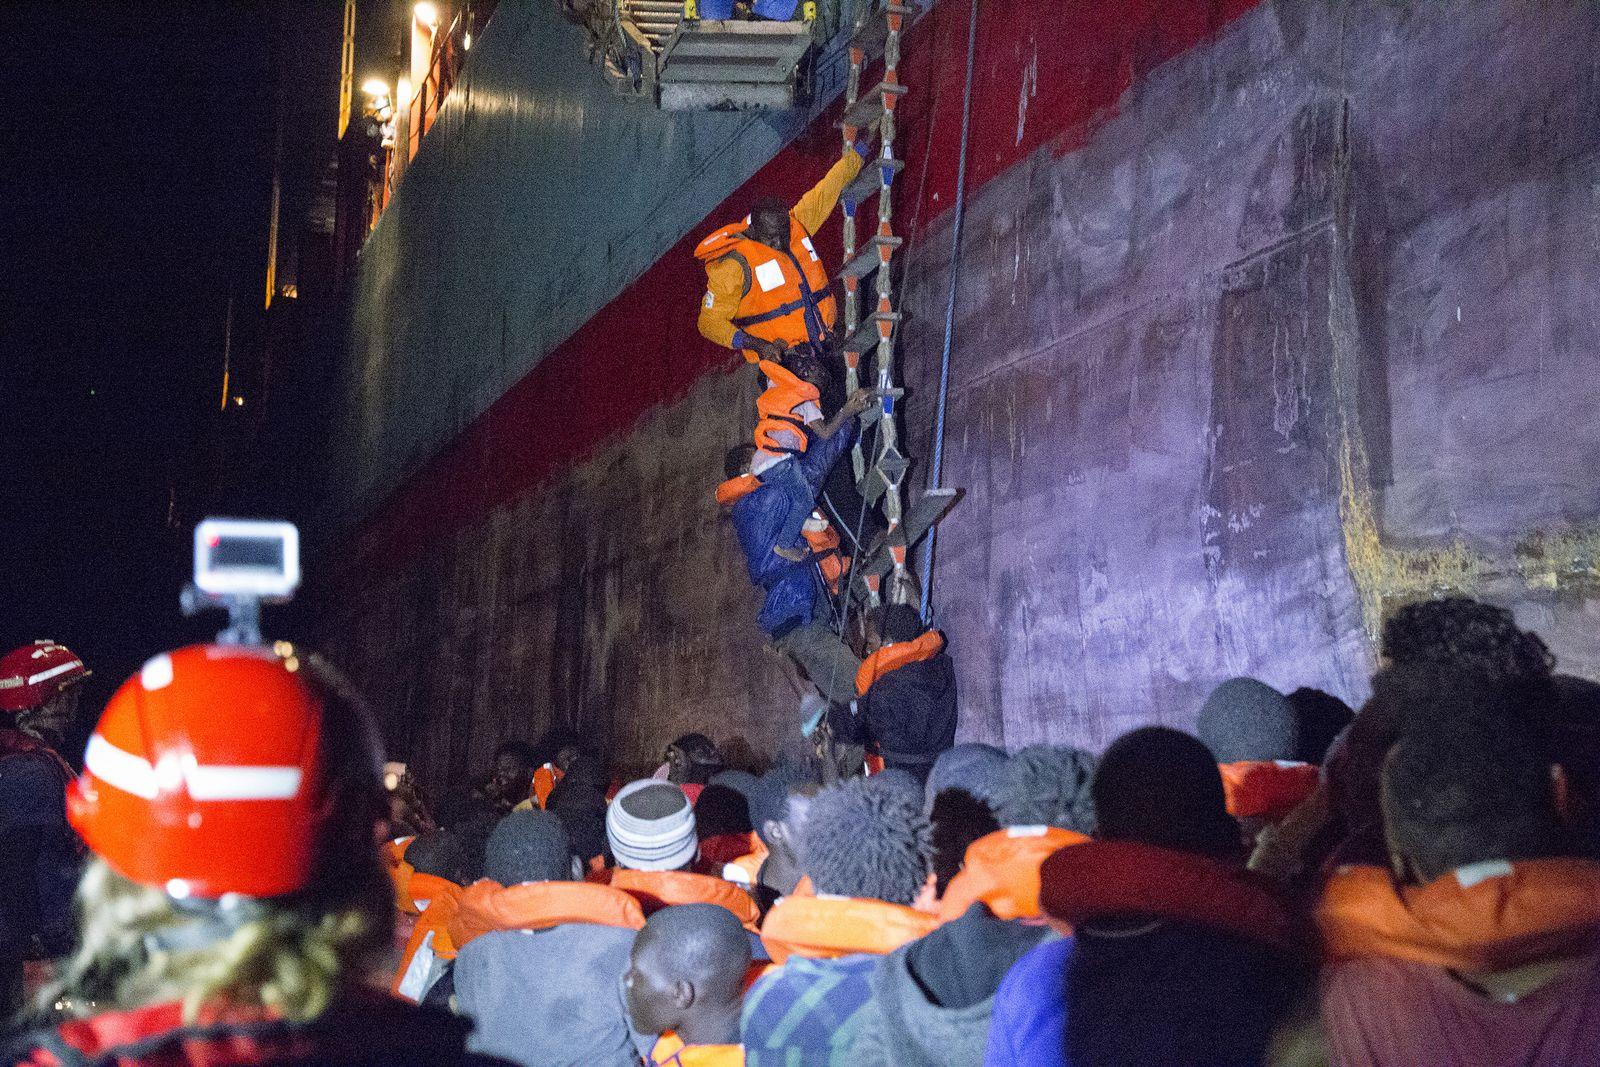 Lifeline/ Alexander Maersk